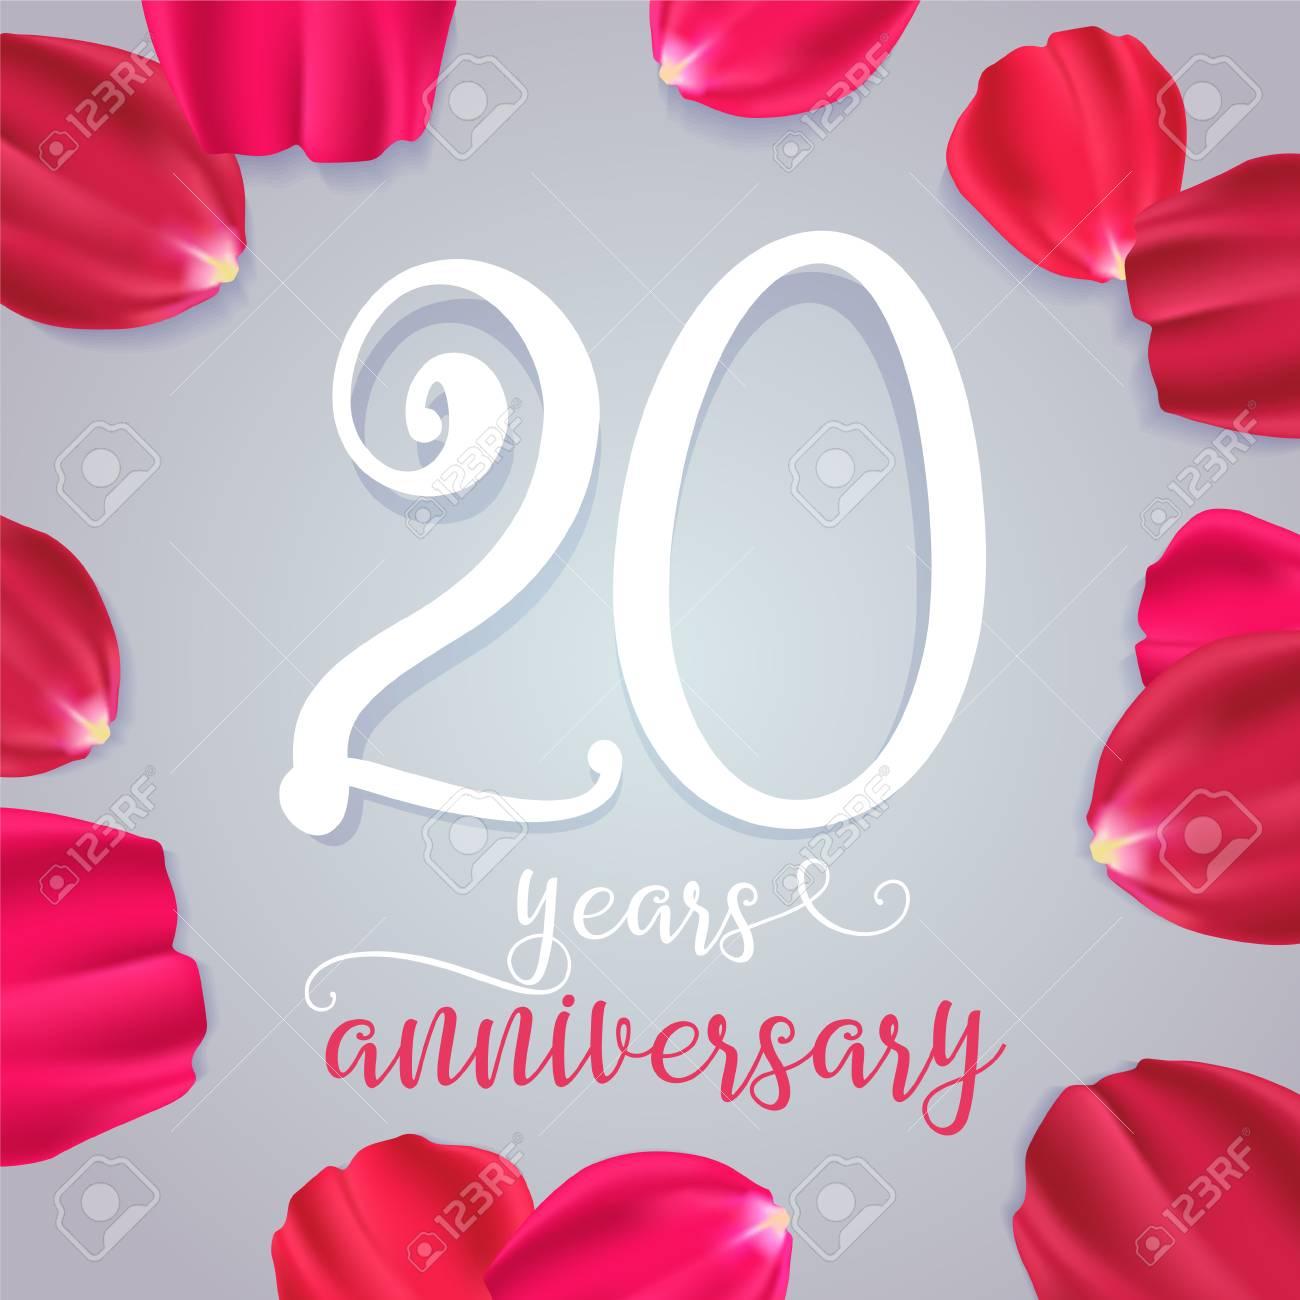 20e anniversaire de mariage